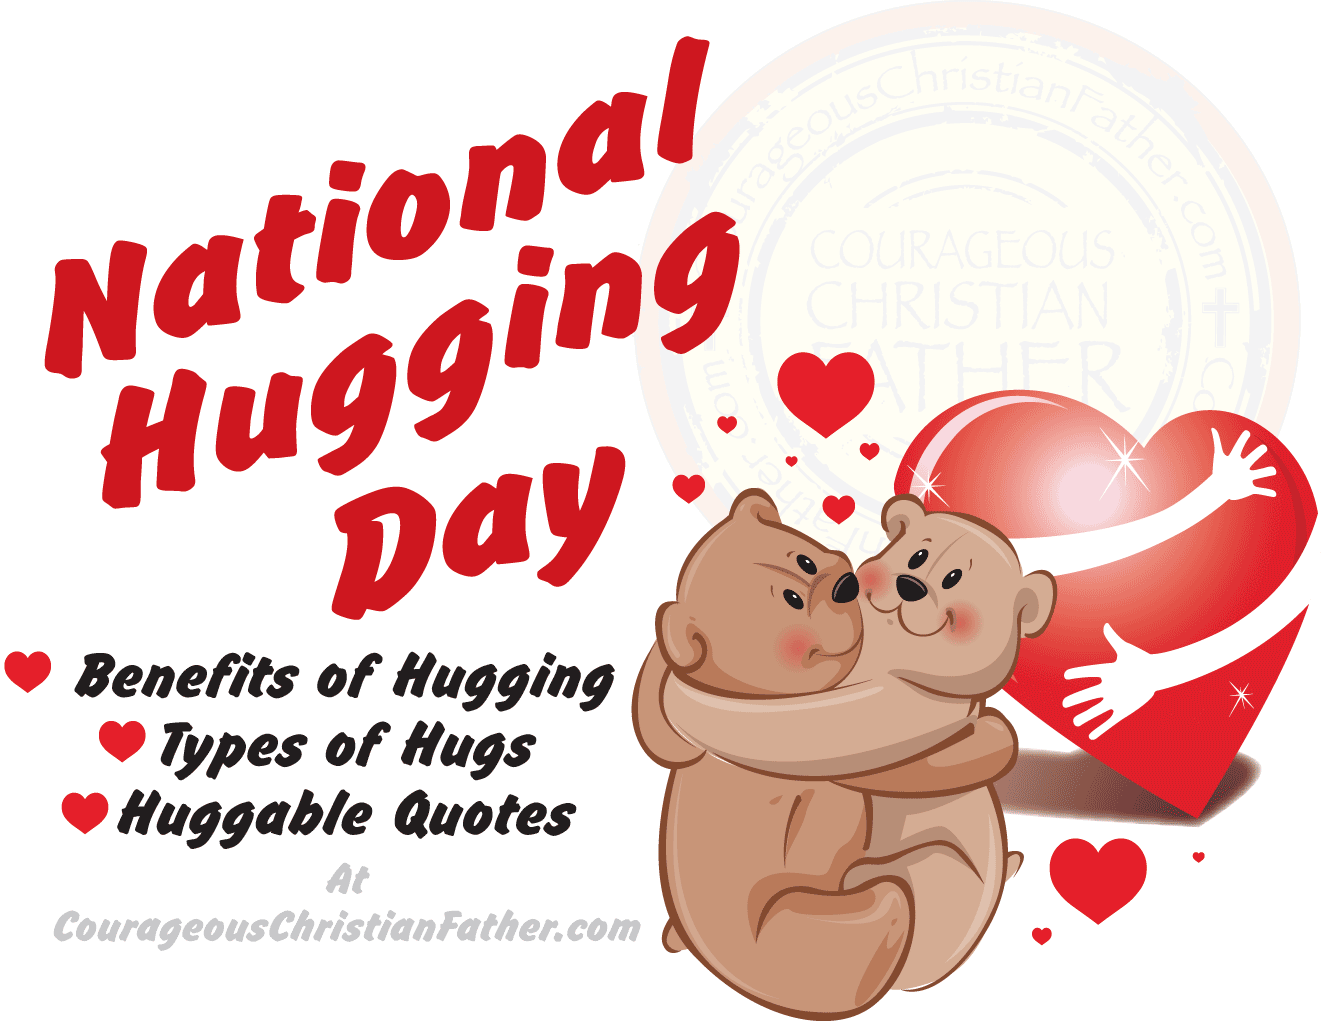 Hug clipart lover hug. National hugging day courageous